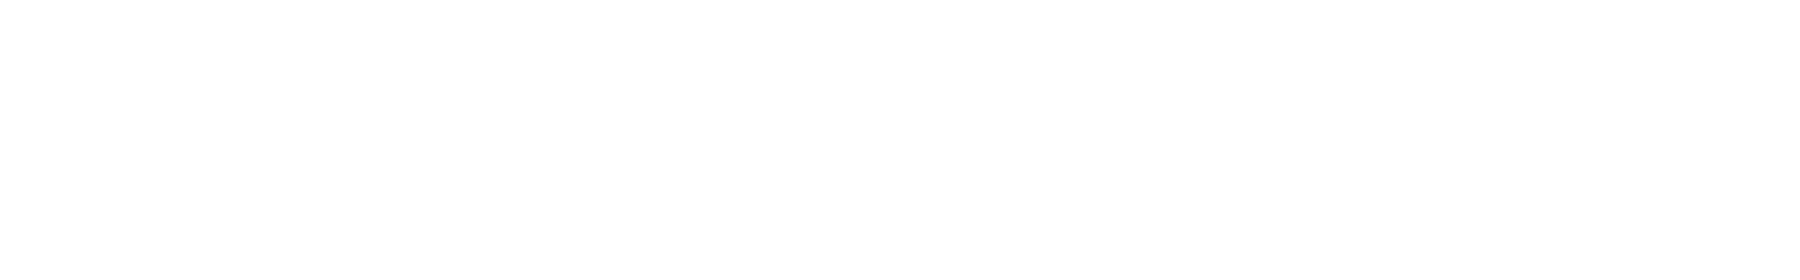 273208 stellarzzzz wav